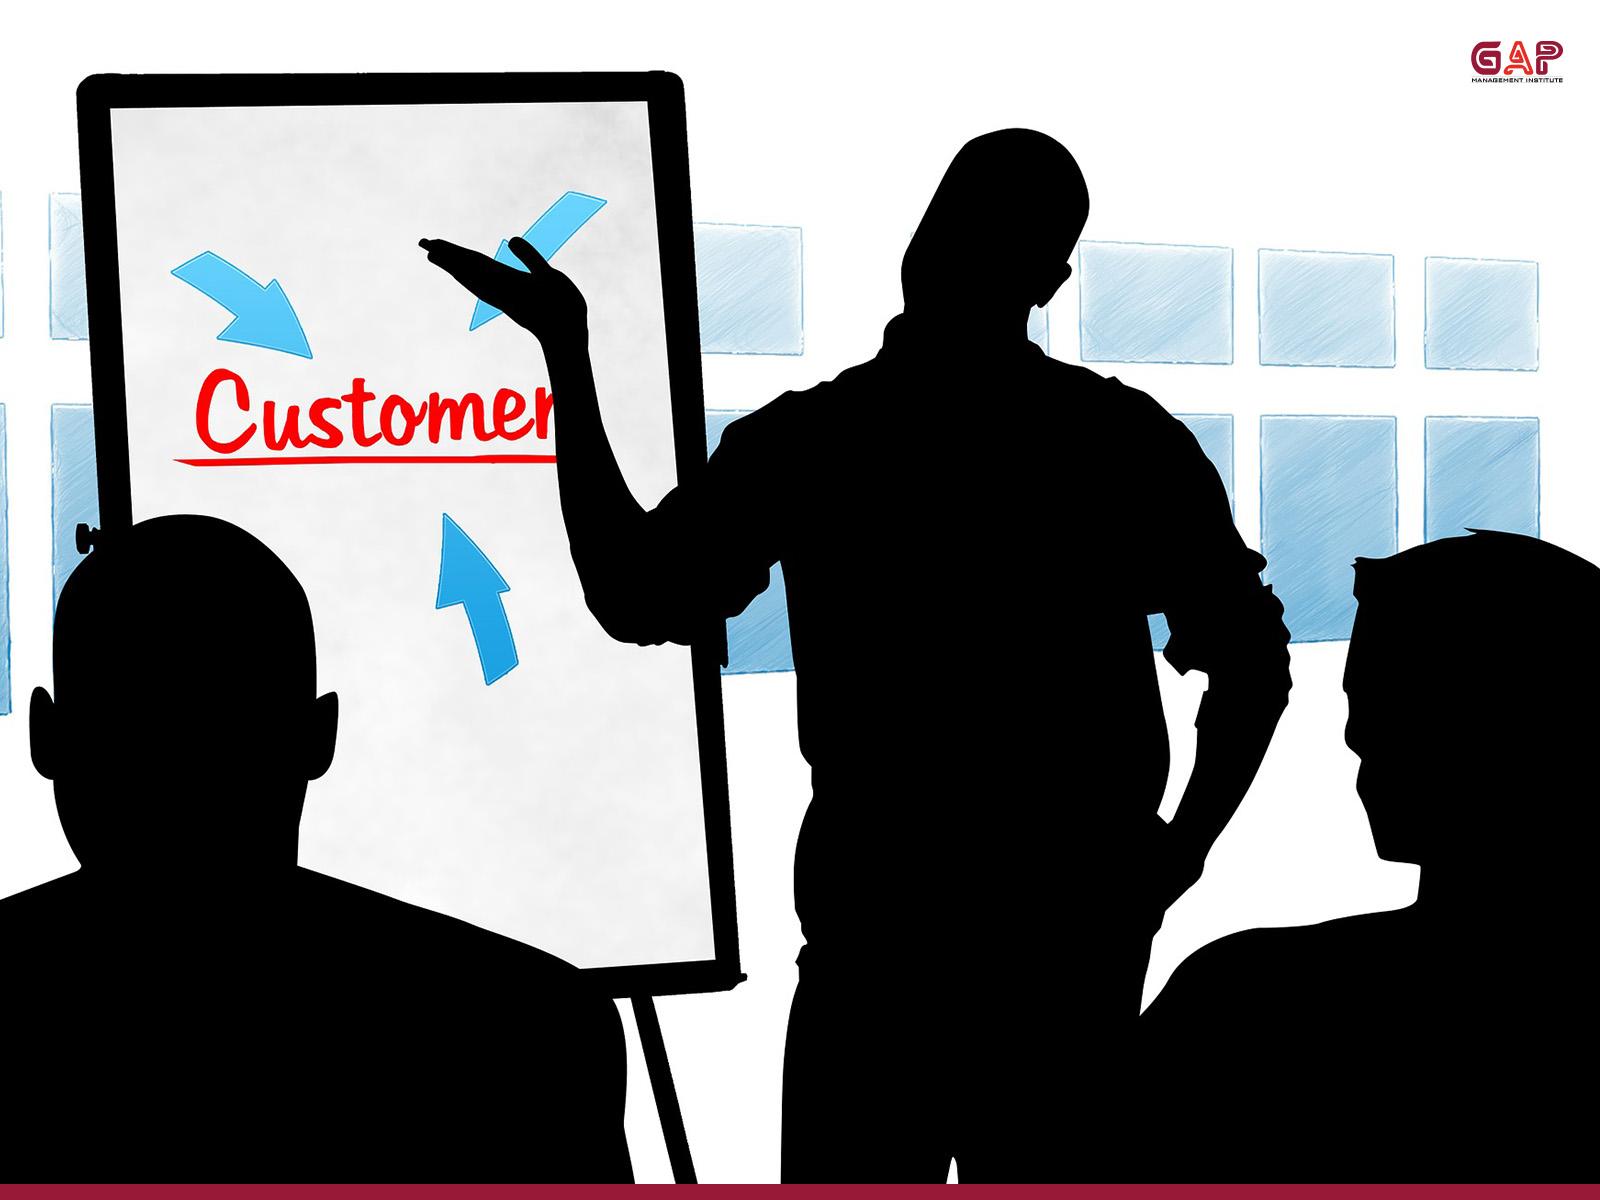 Customer Service Strategy: Providing World Class Service